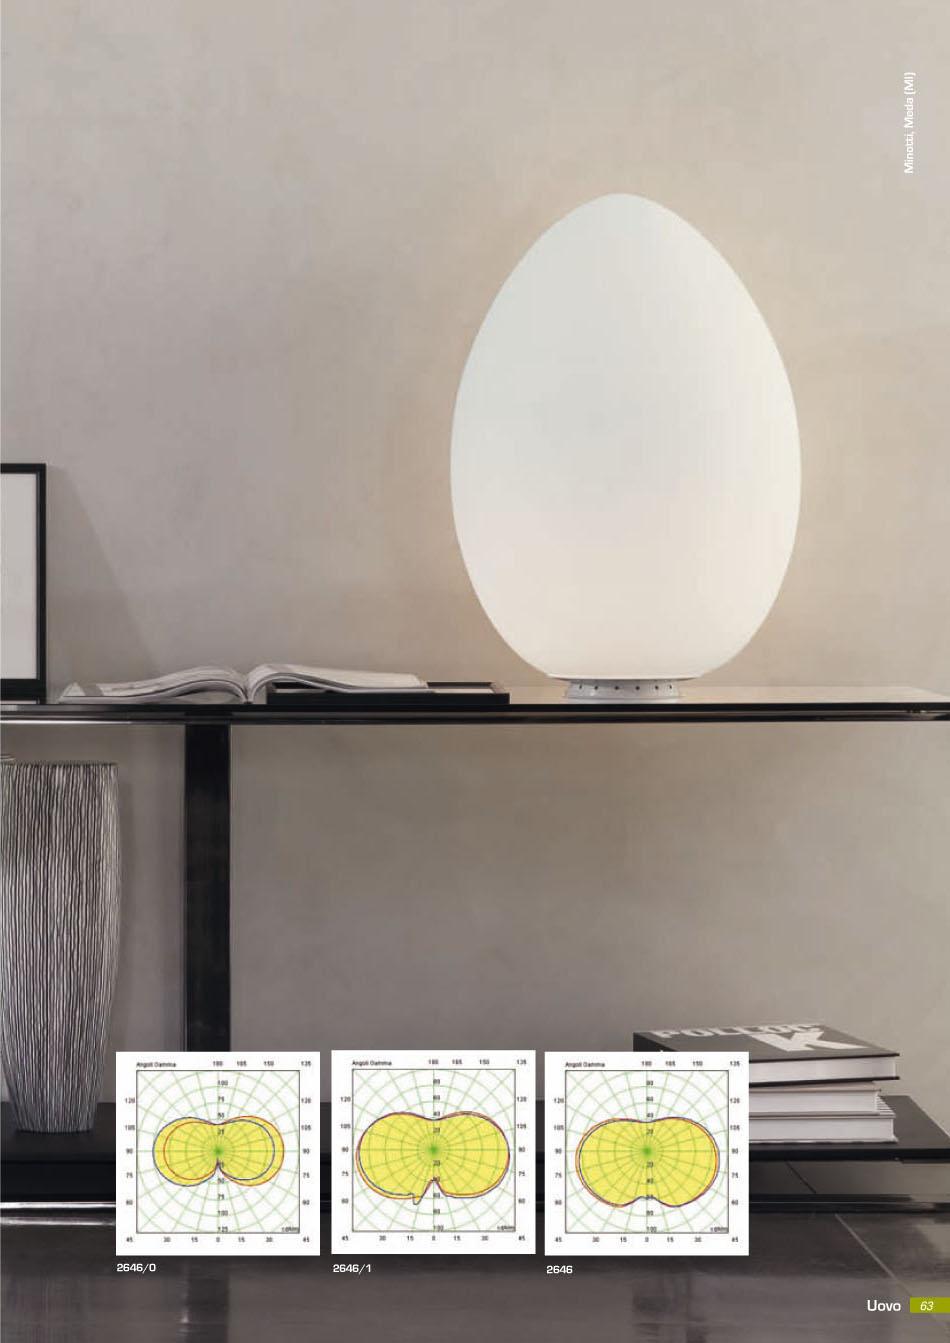 Fontana arte uovo lampada da tavolo bianca 43x62cm 2646 for Lampada uovo fontana arte